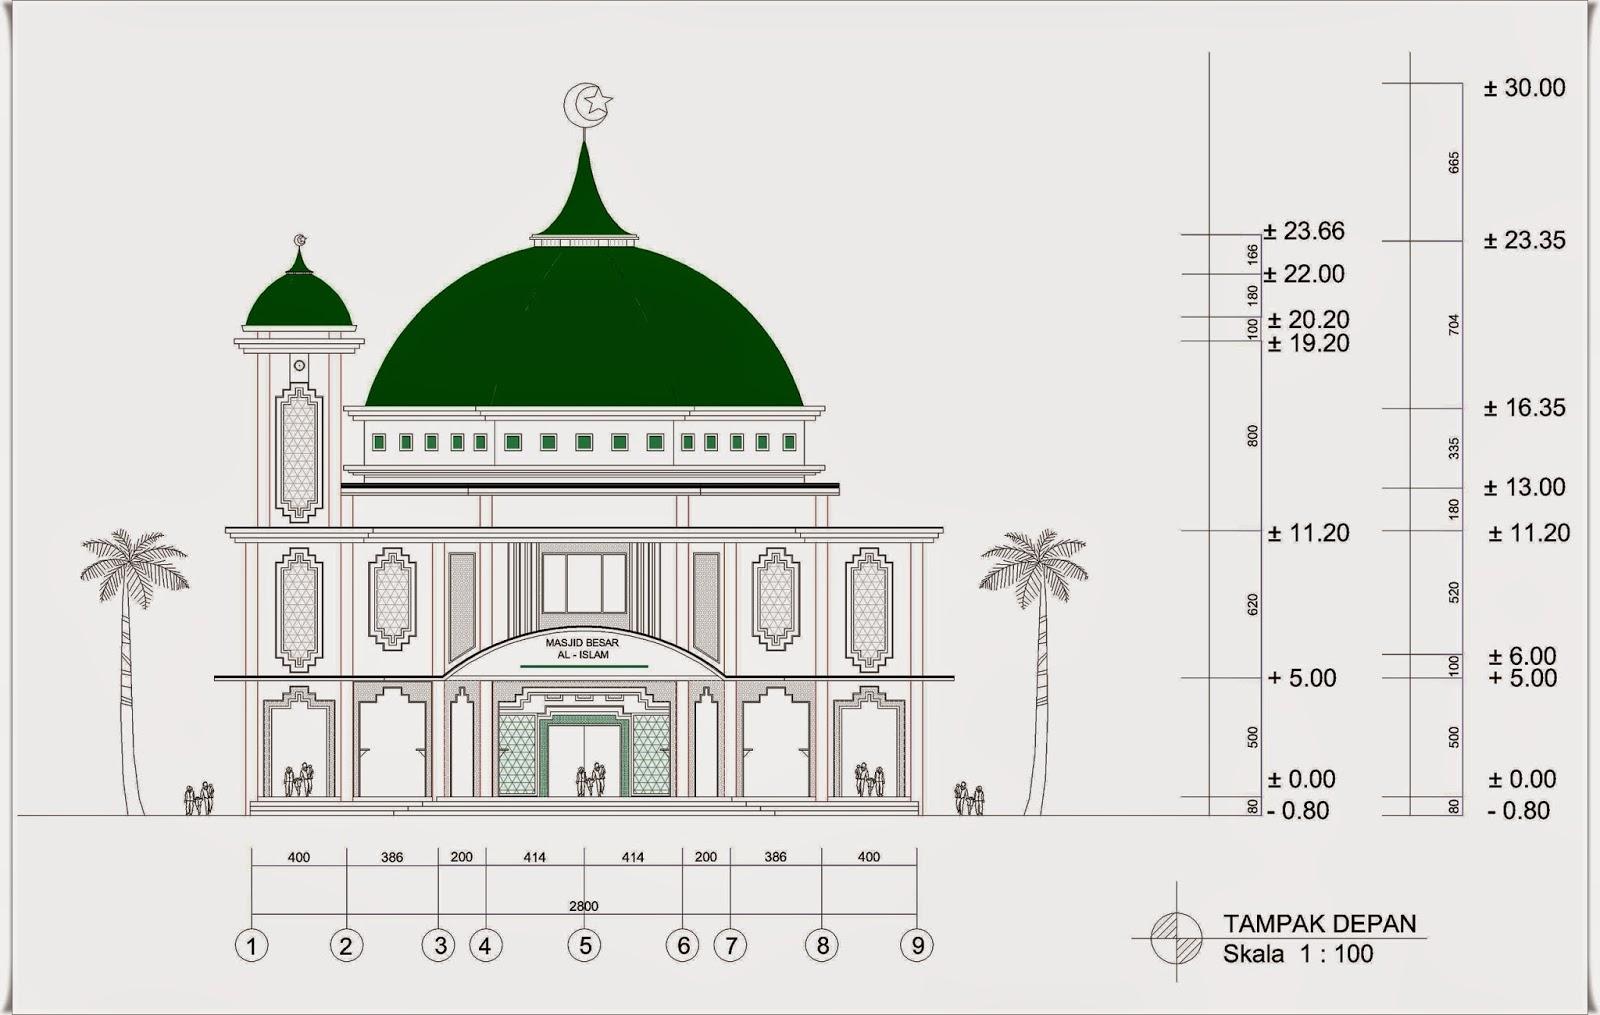 Galeri Sketsa Gambar Masjid Paling Mudah Terbaru